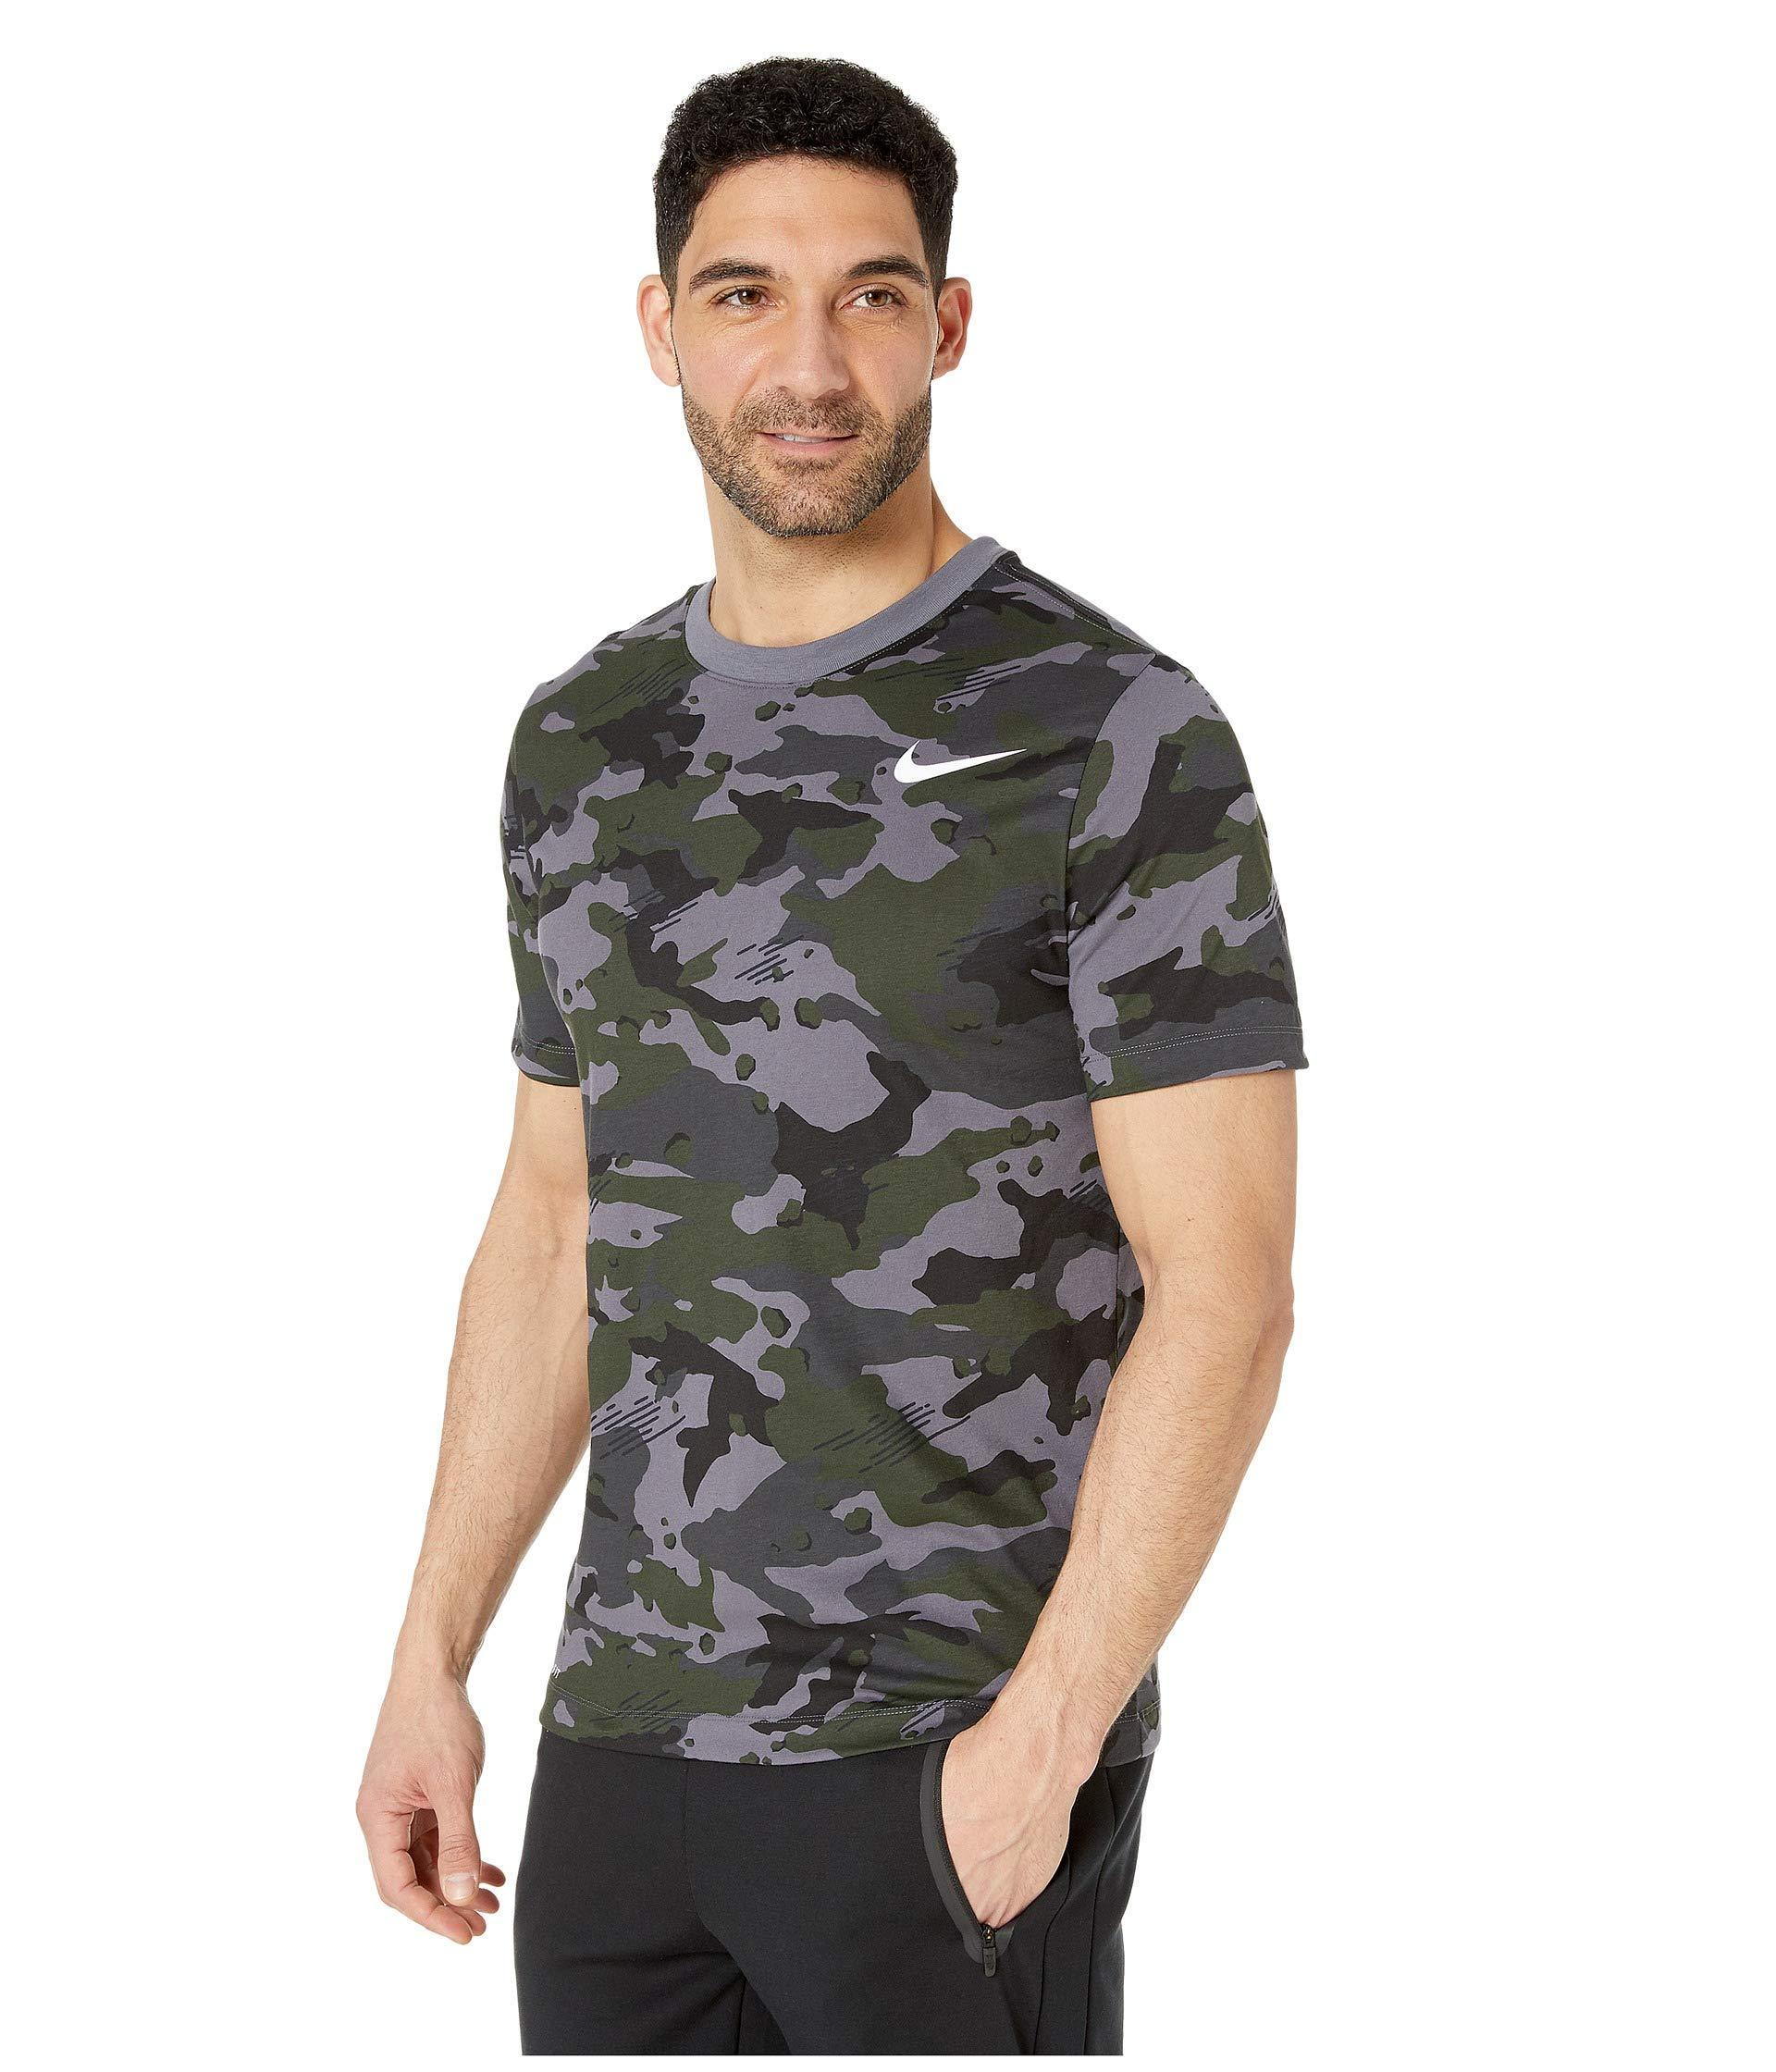 88dbe5602 Lyst - Nike Dry Tee Dri-fittm Cotton Camo All Over Print (white/black) Men's  T Shirt in Gray for Men